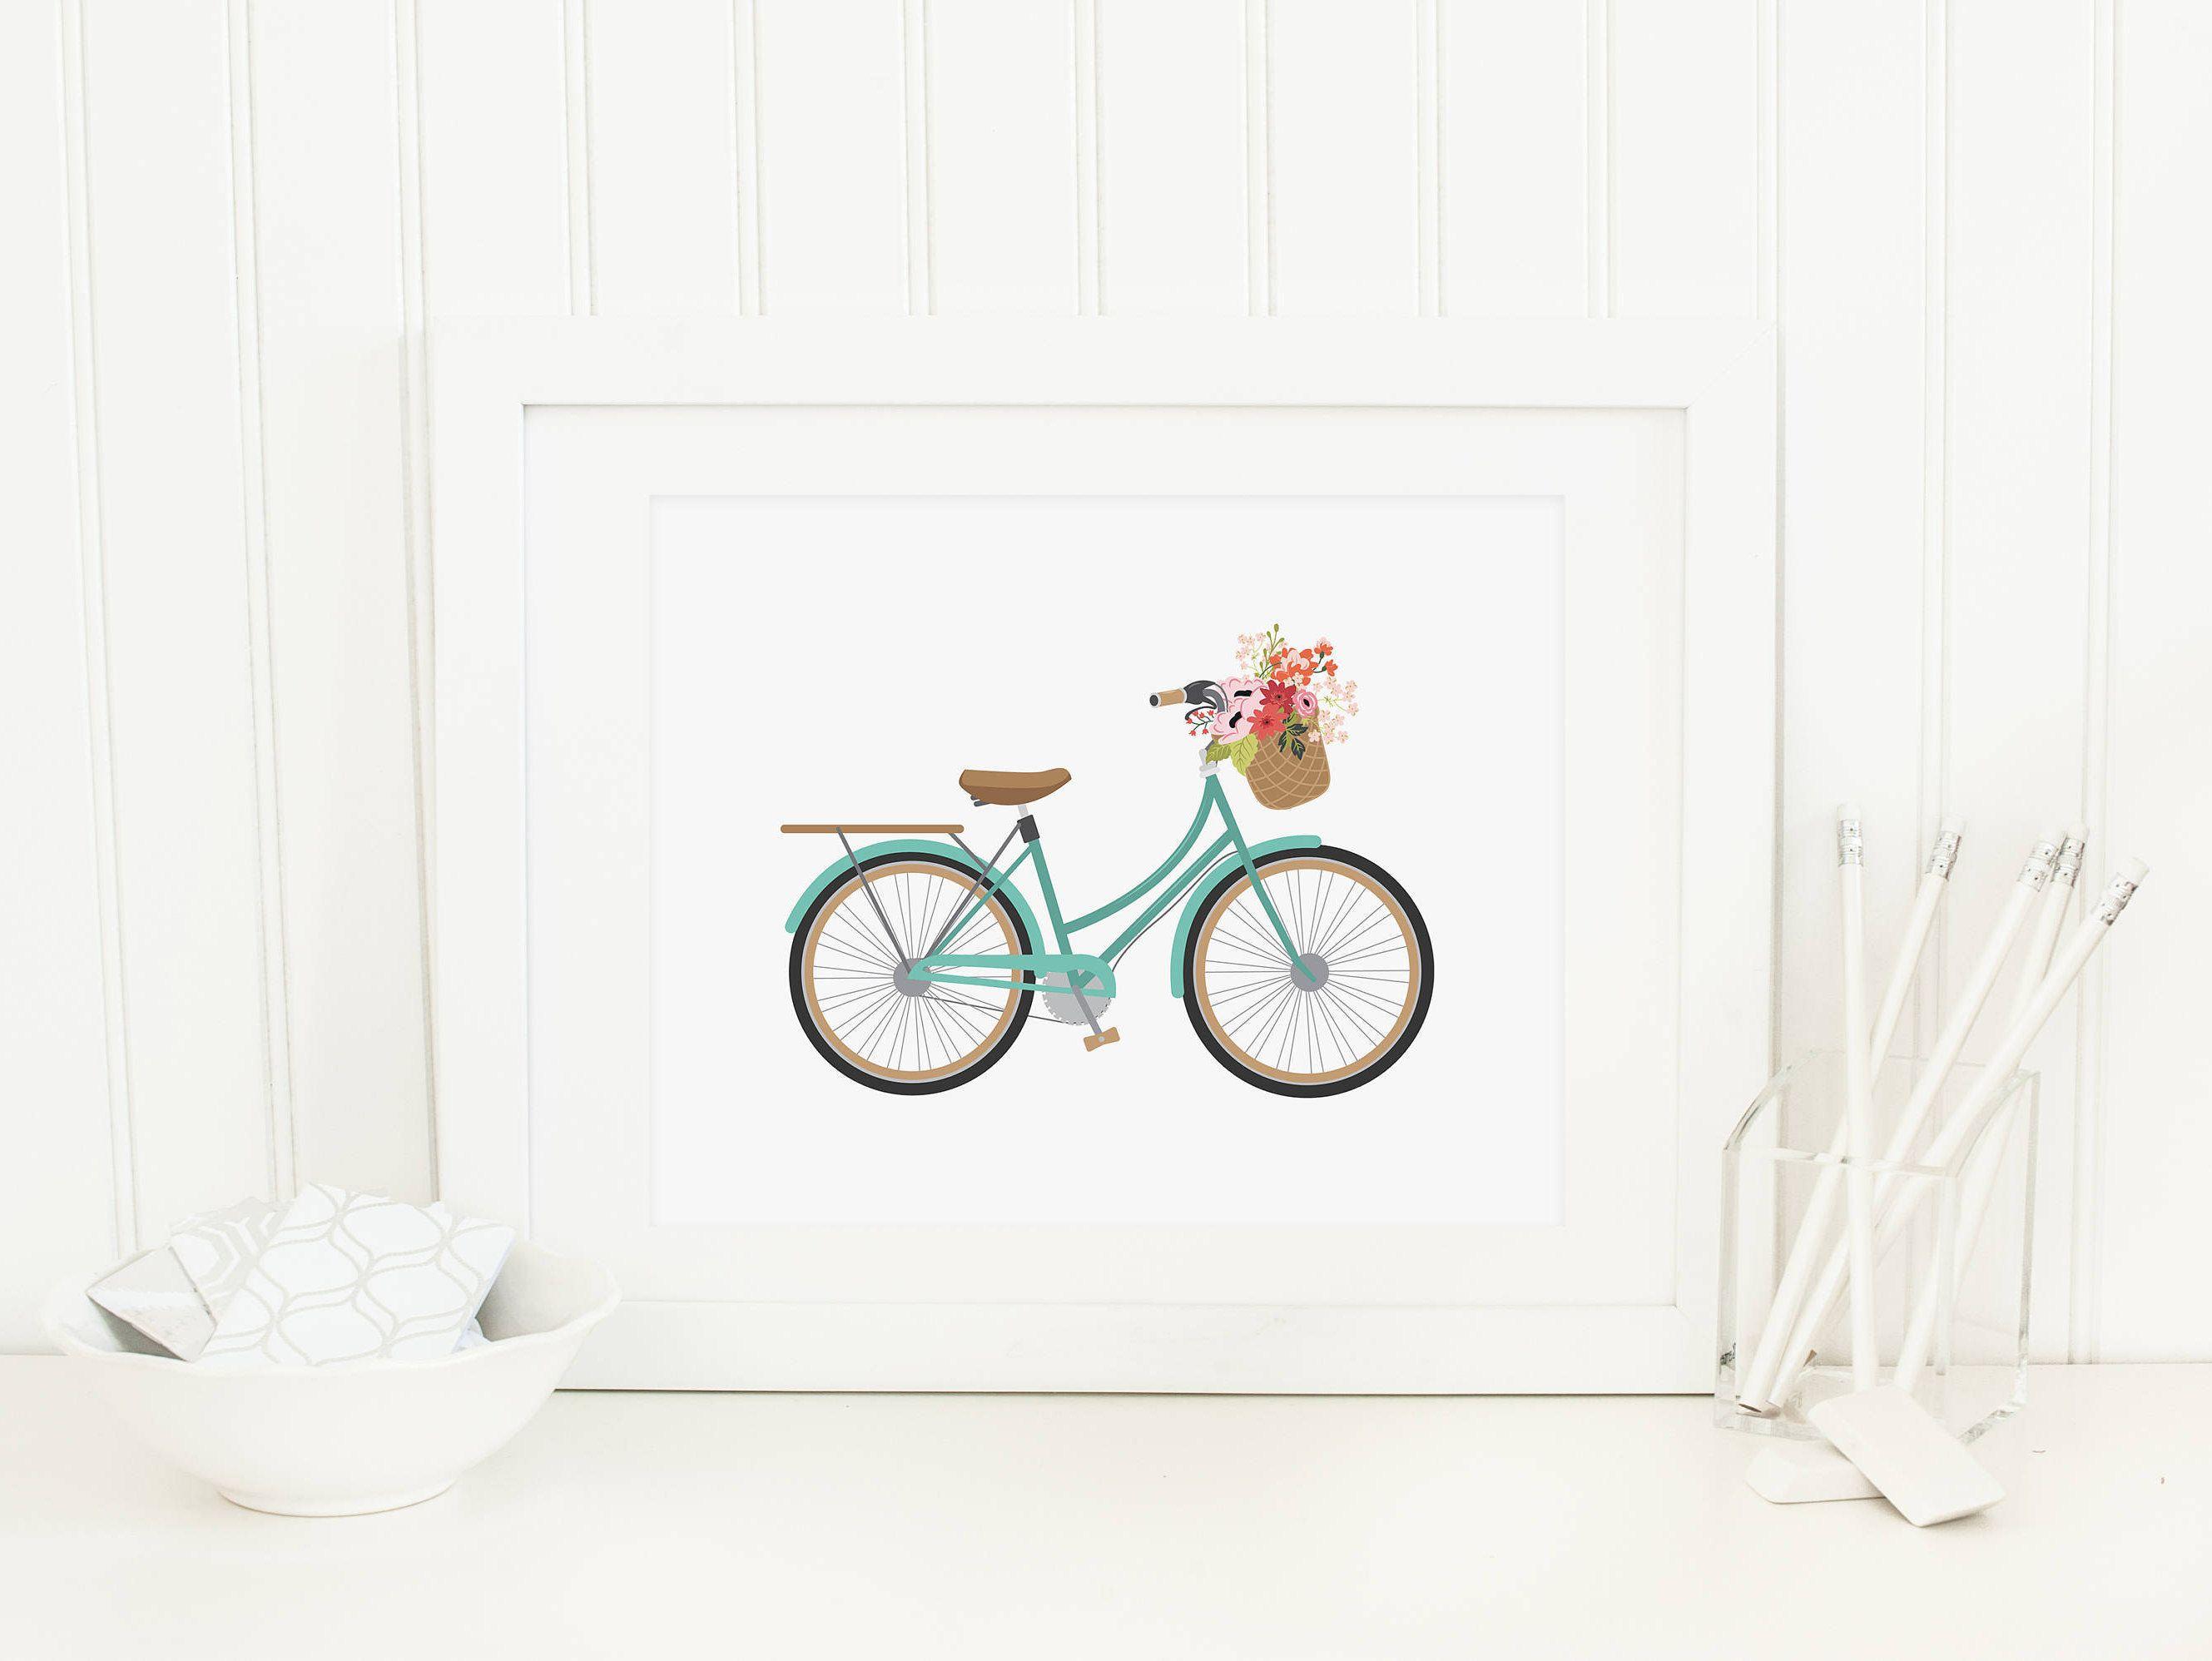 Bicycle Printable Aqua Bicycle Wall Art Bicycle With Flower Basket ...